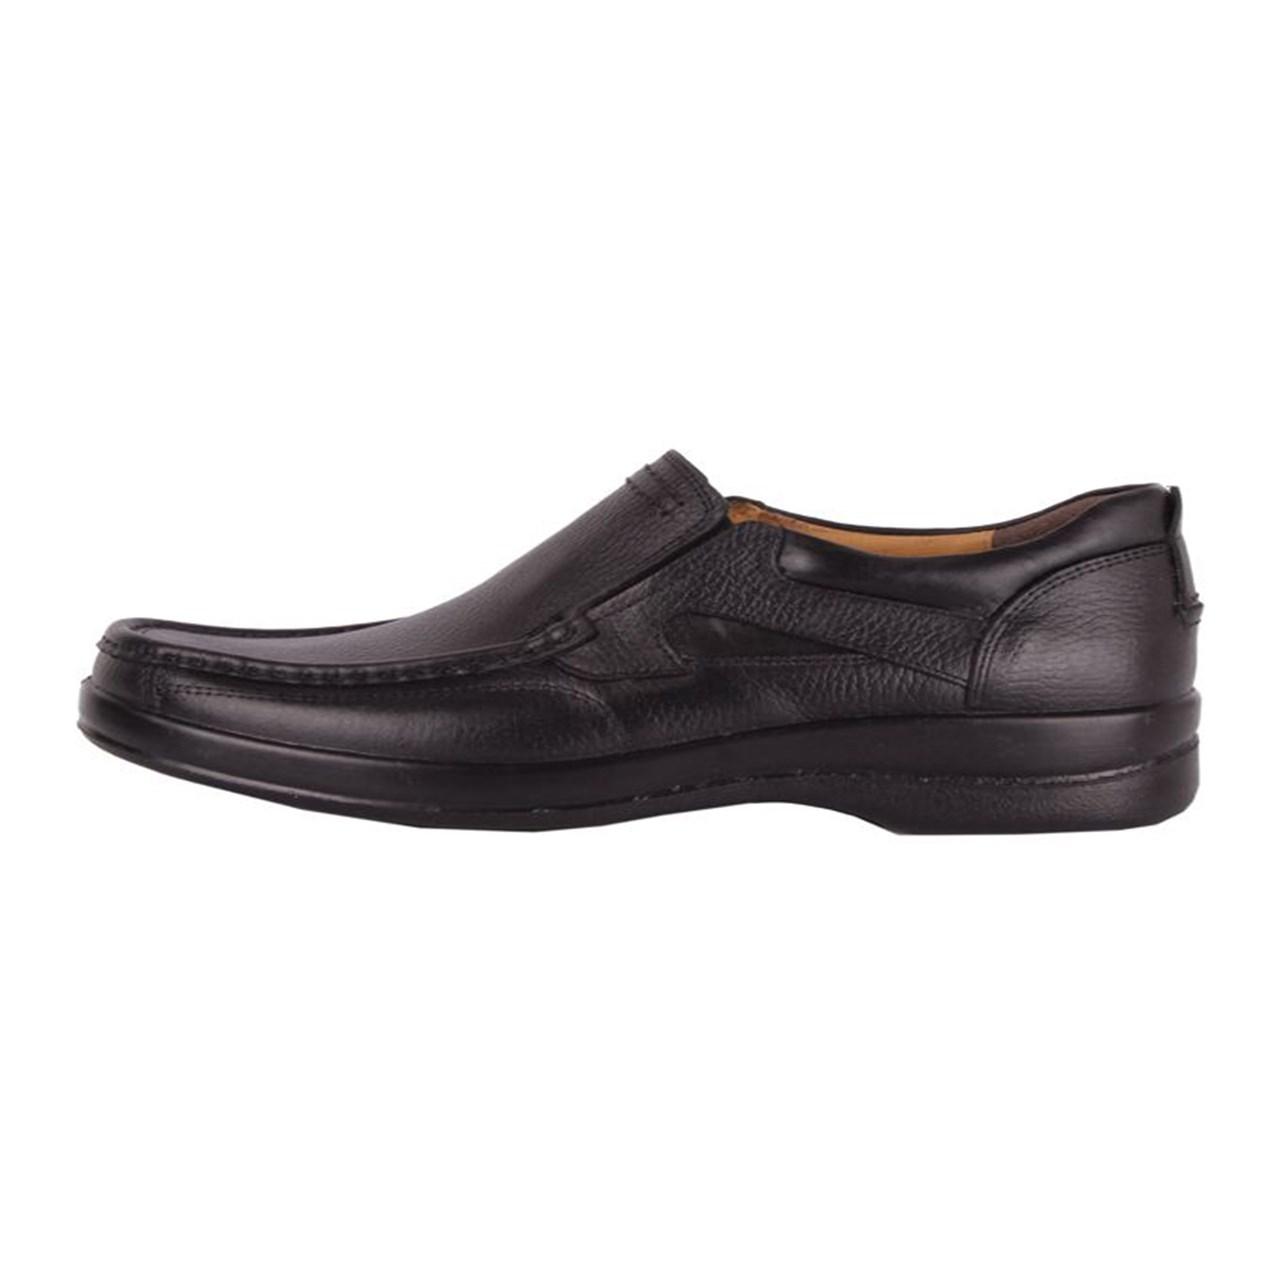 کفش چرم طبی مهاجر مردانه مدل M6m